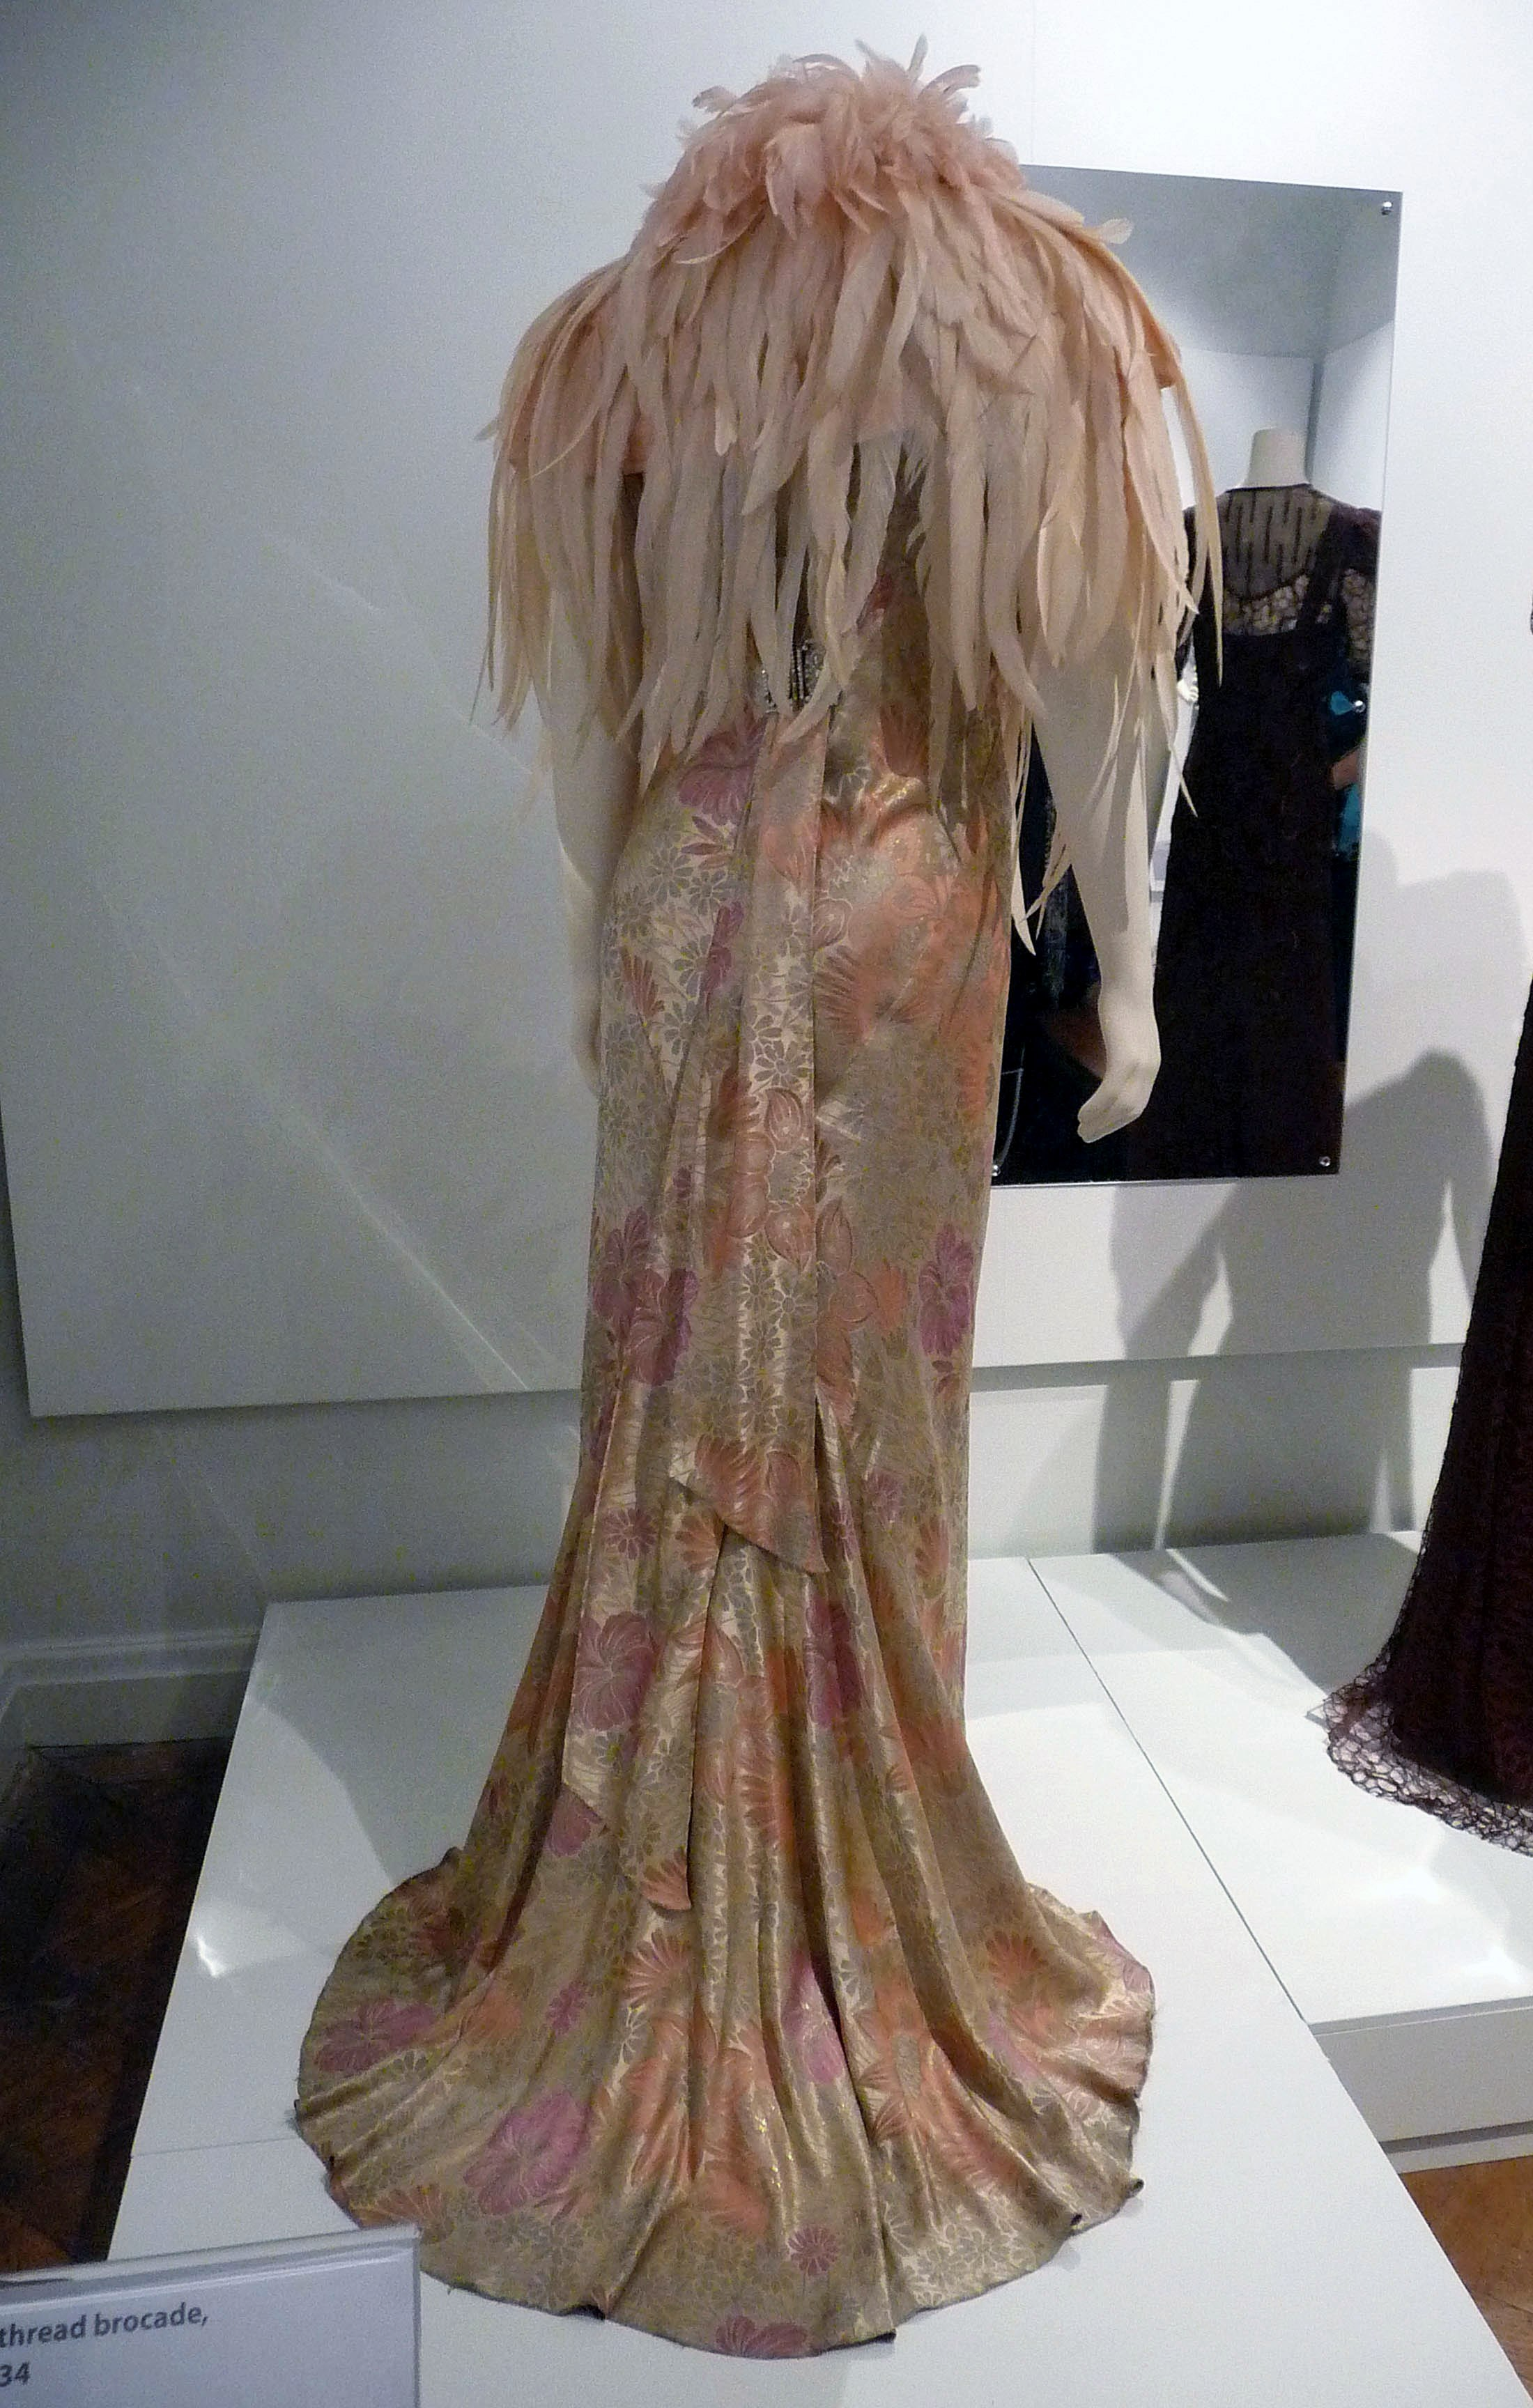 Evening dress, silk & metal thread brocade, 1934. Shoulder cape, silk & dyed cock's feathers, 1932-34